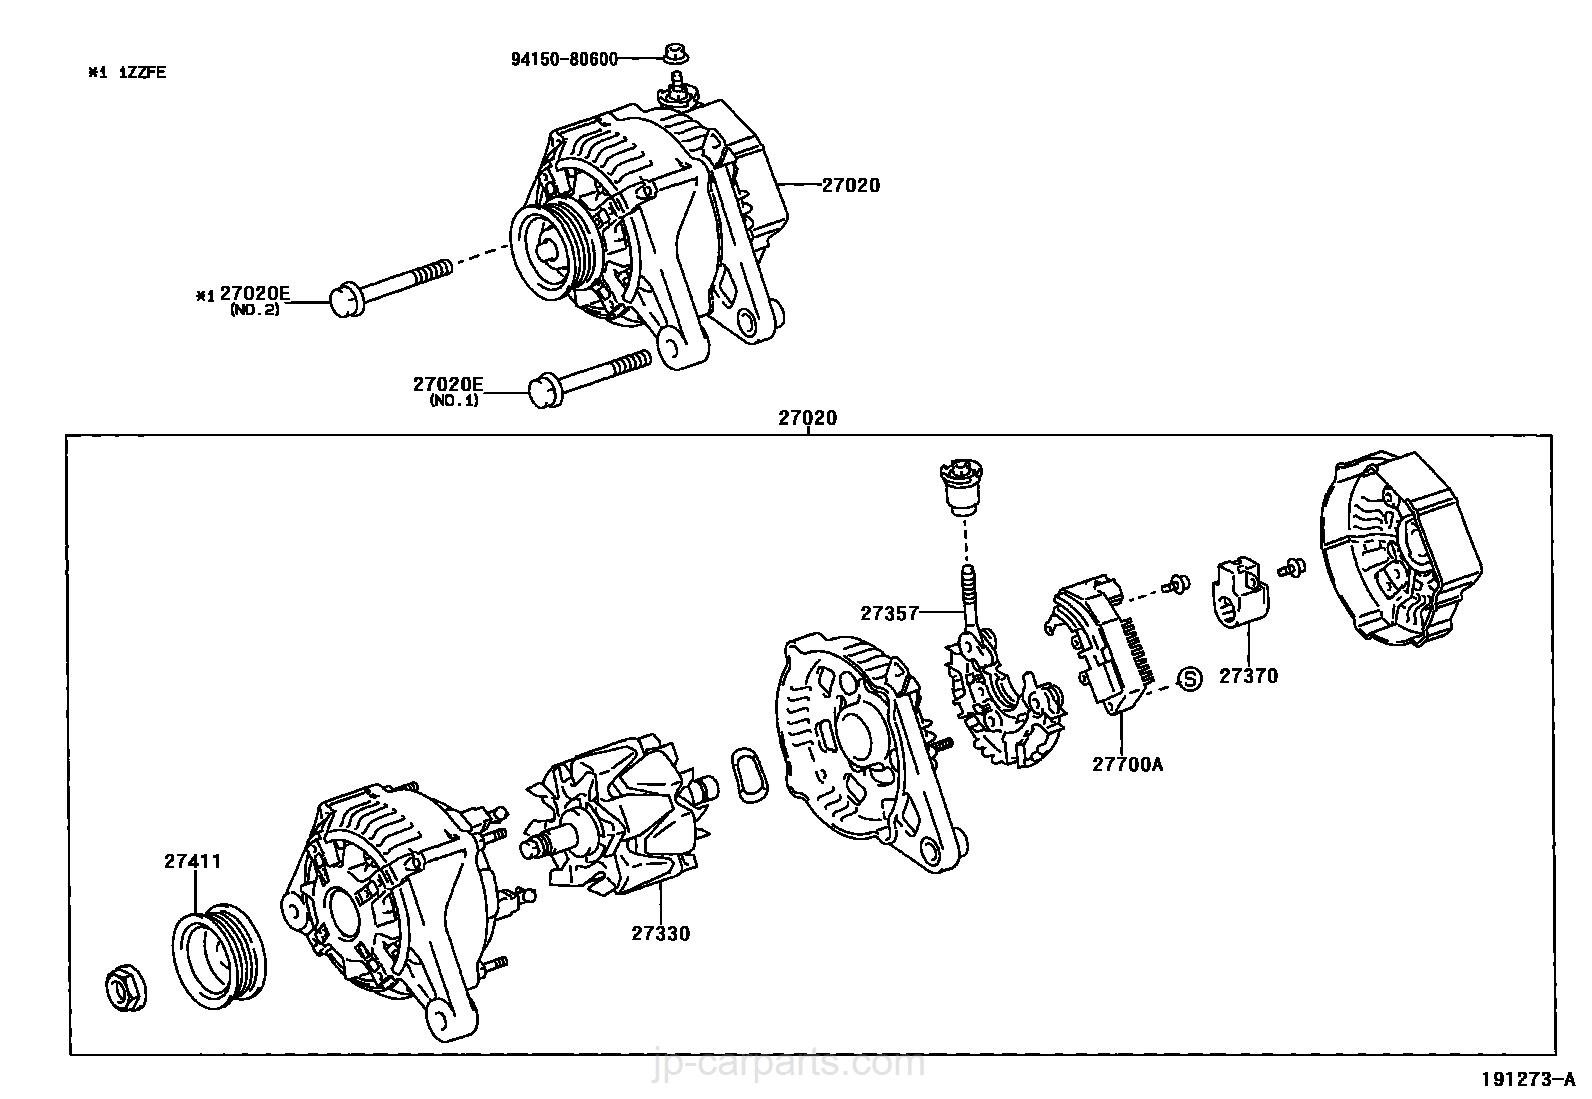 Alternator Toyota Part List|jp Carparts Com 2007 Toyota Corolla Engine  Diagram 1zz Fe Engine Diagram Alternator